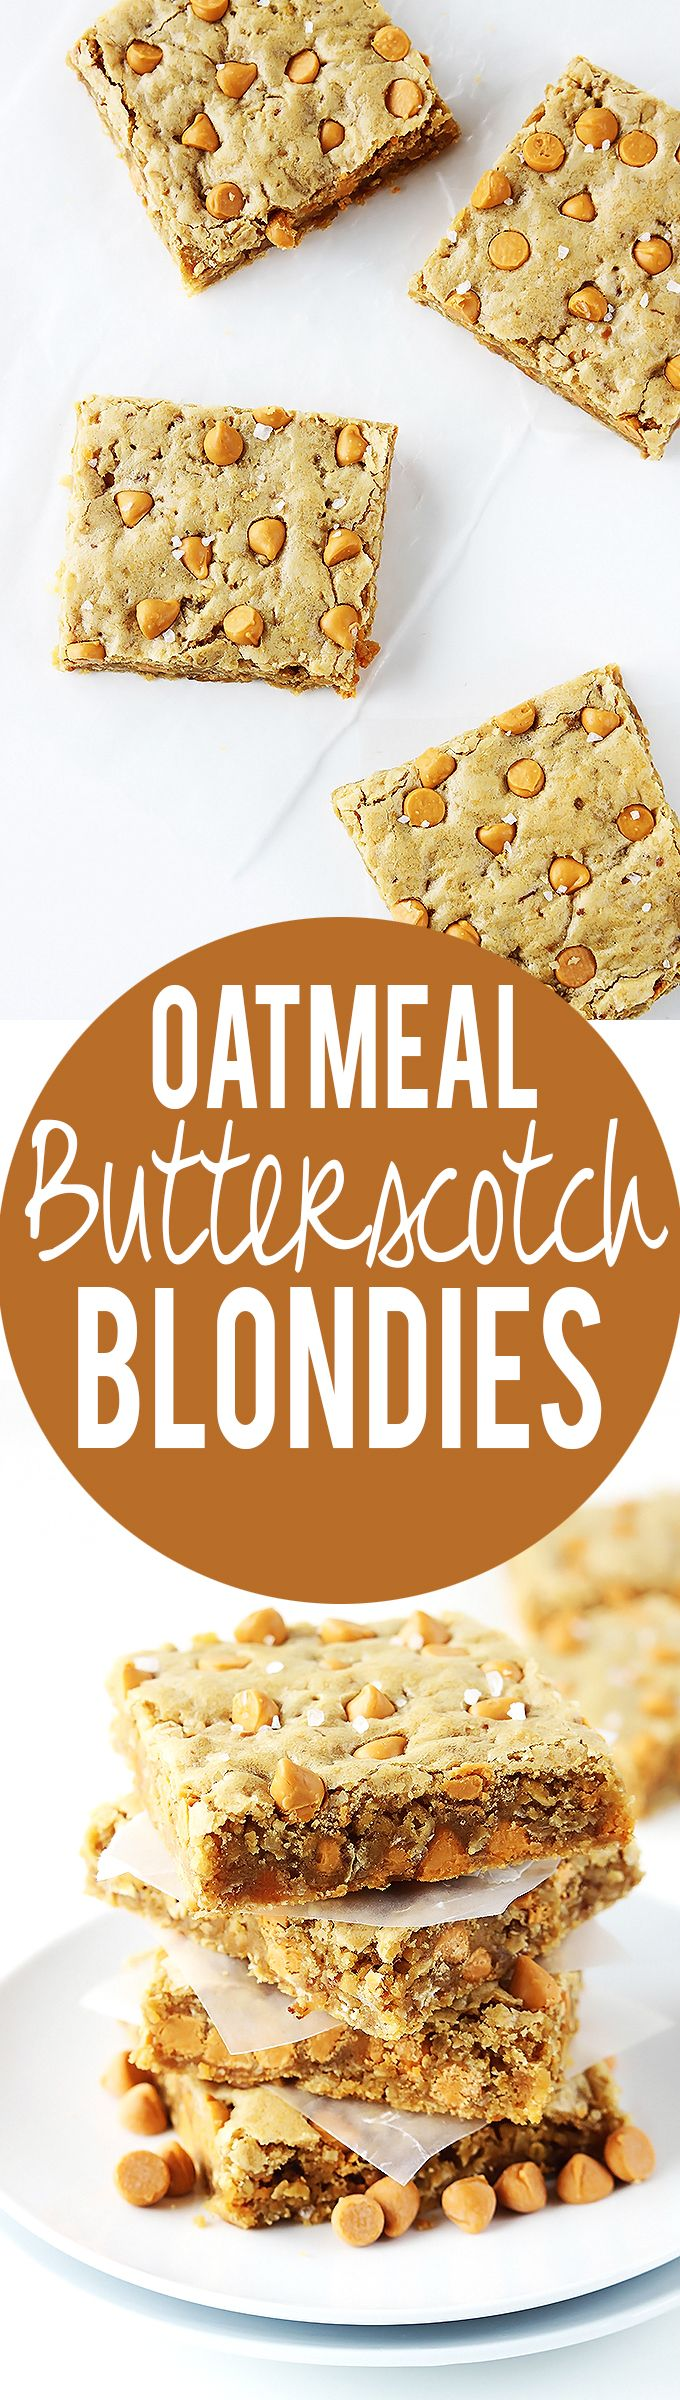 Butterscotch Blondie Oatmeal Cookies Recipe — Dishmaps